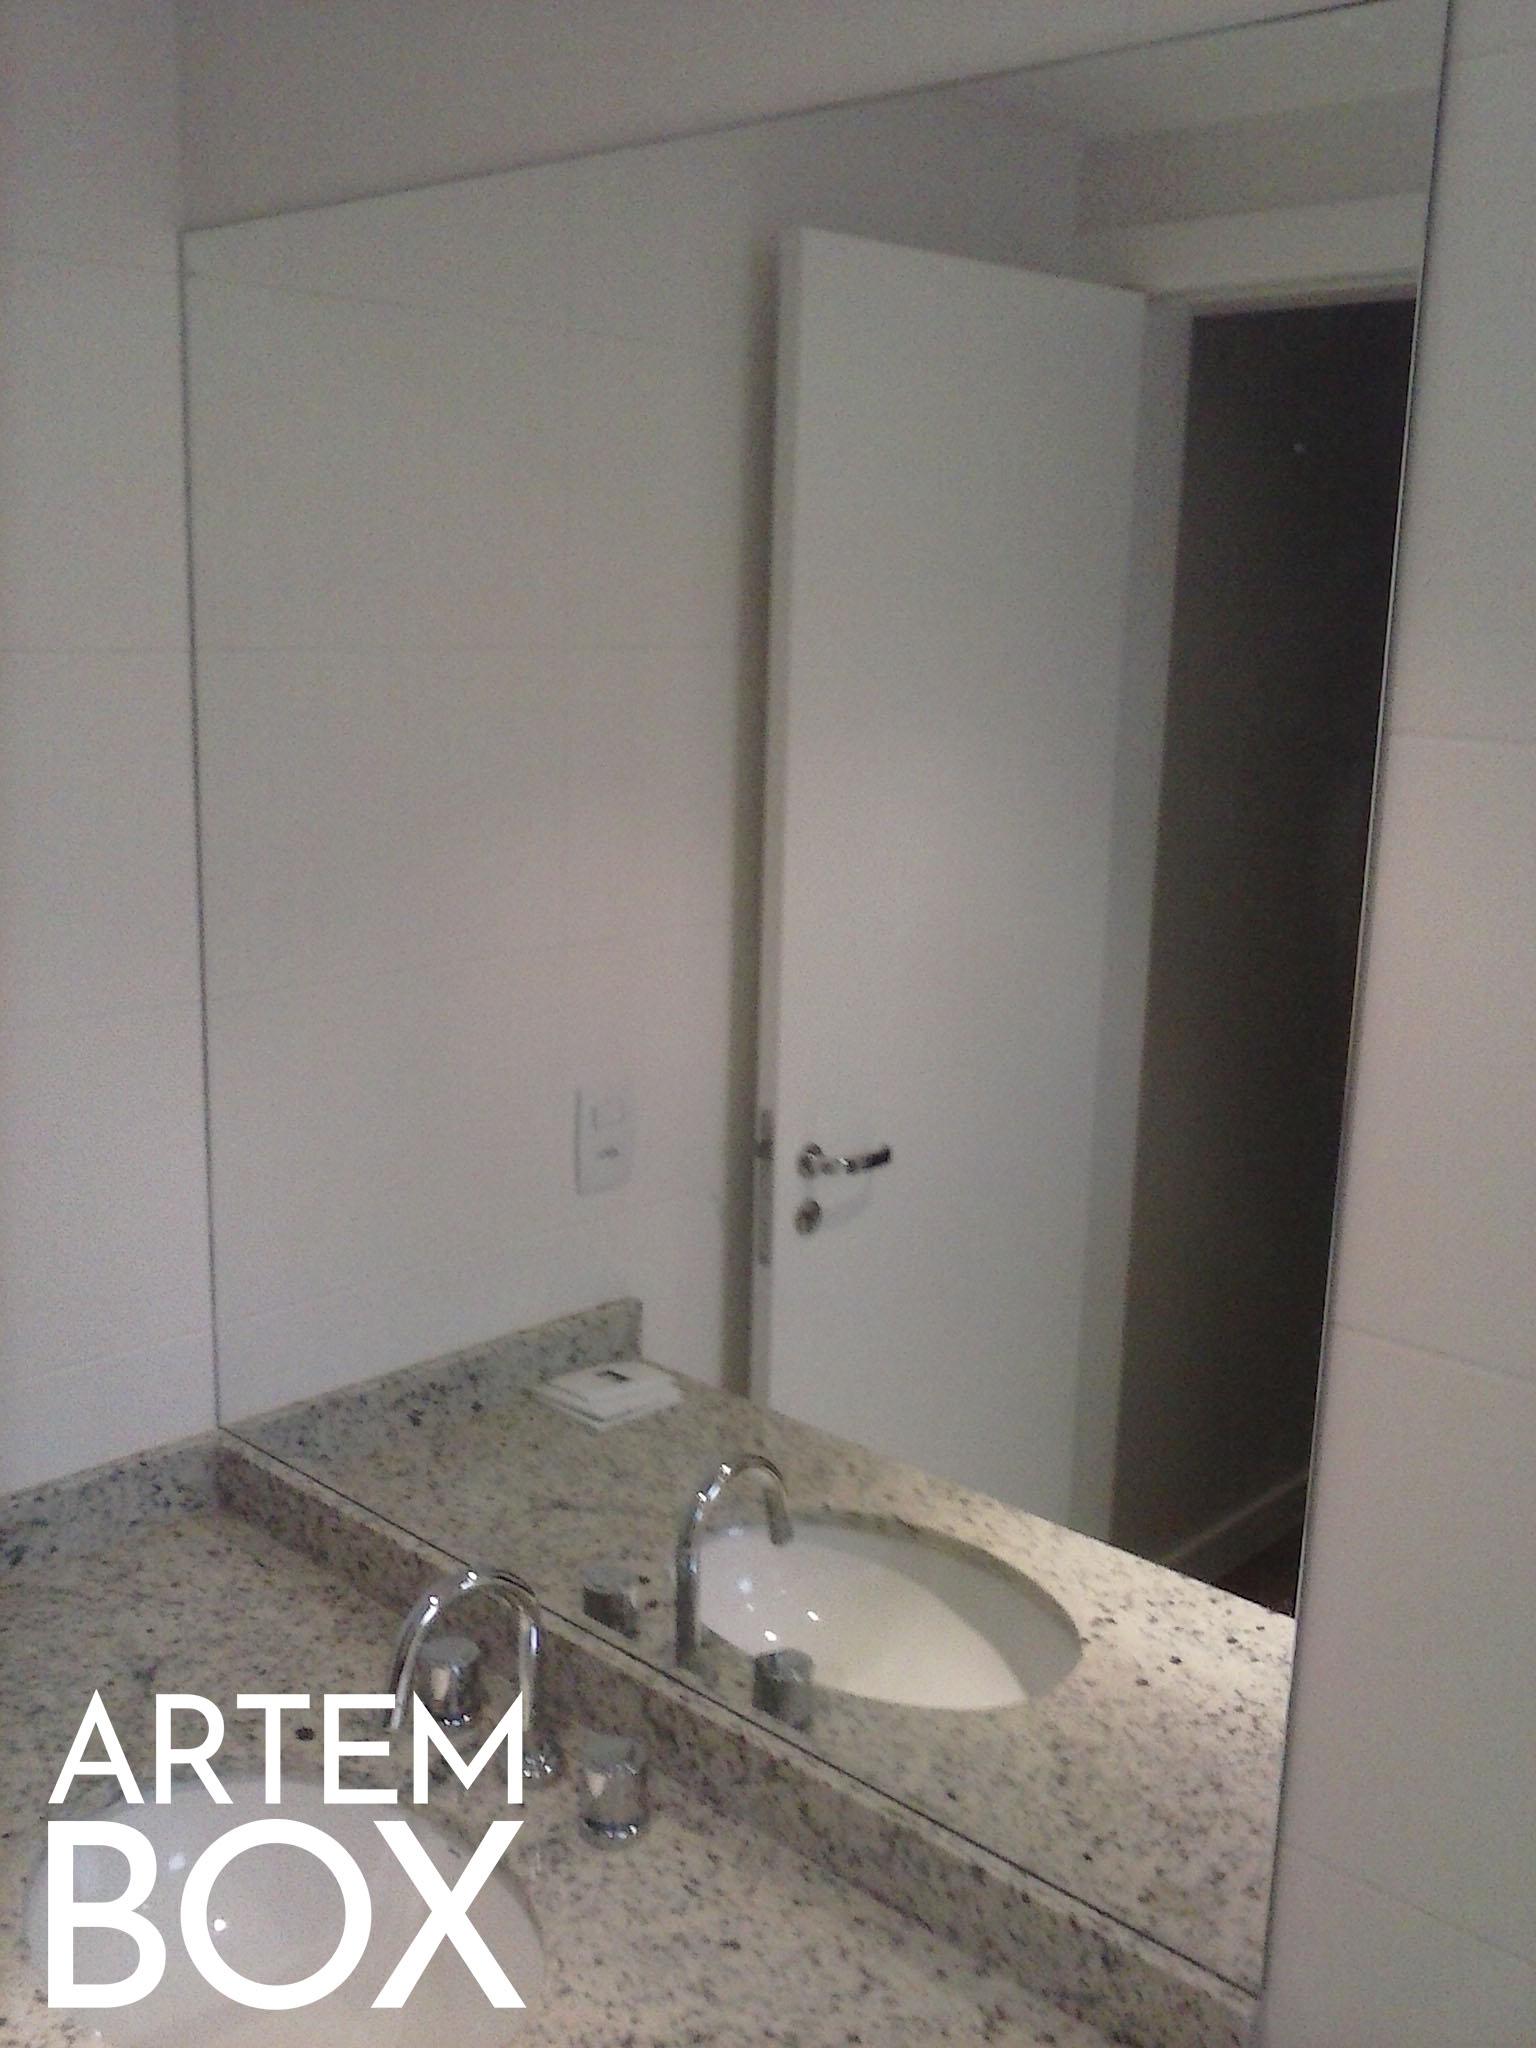 Espelho Lapidado Artembox